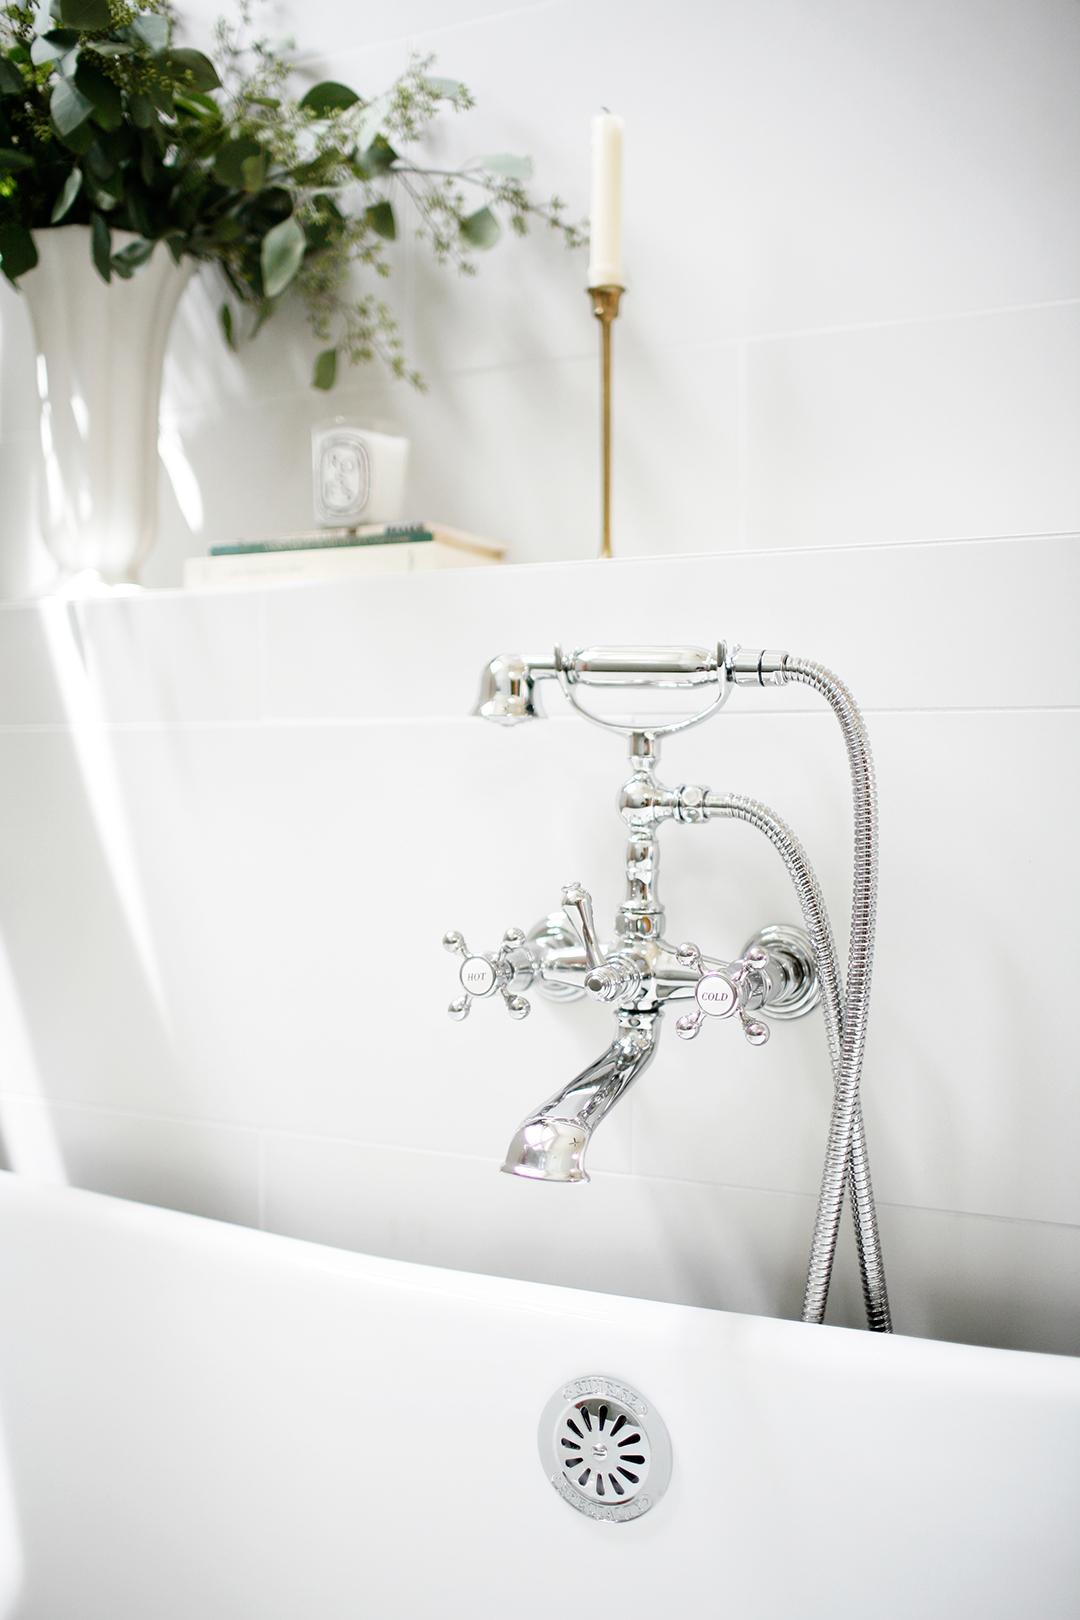 08-JGID-Sun-Valley-Bathroom-Remodel.JPG